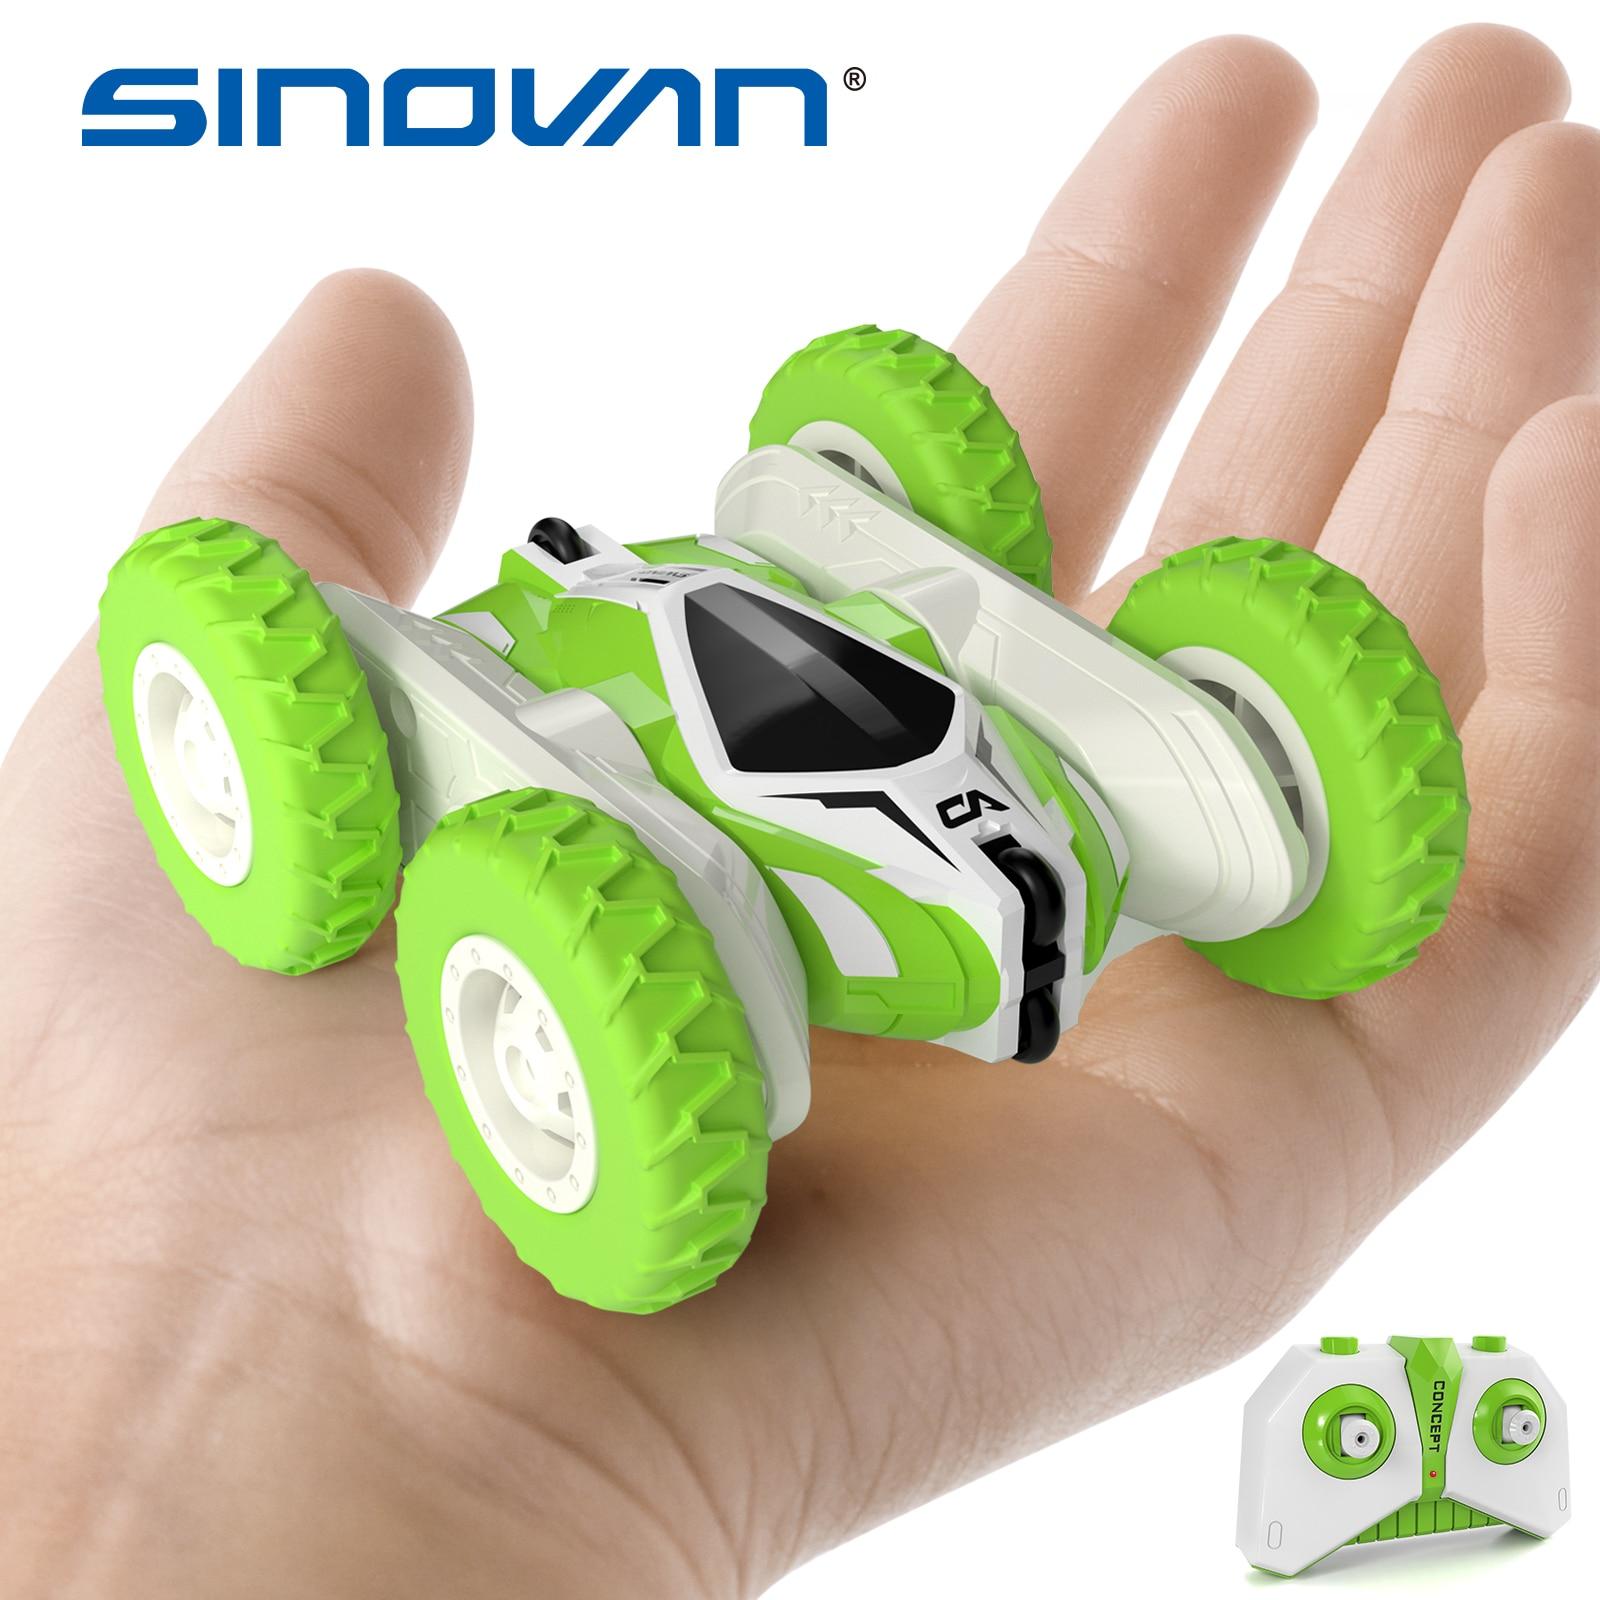 Sinovan Hugine-سيارة تحكم عن بعد للأطفال ، 2.4G 4CH ، سيارة تشوه بهلوانية مع جهاز تحكم عن بعد ، سيارة قابلة للطي 360 درجة ، سيارة روبوت